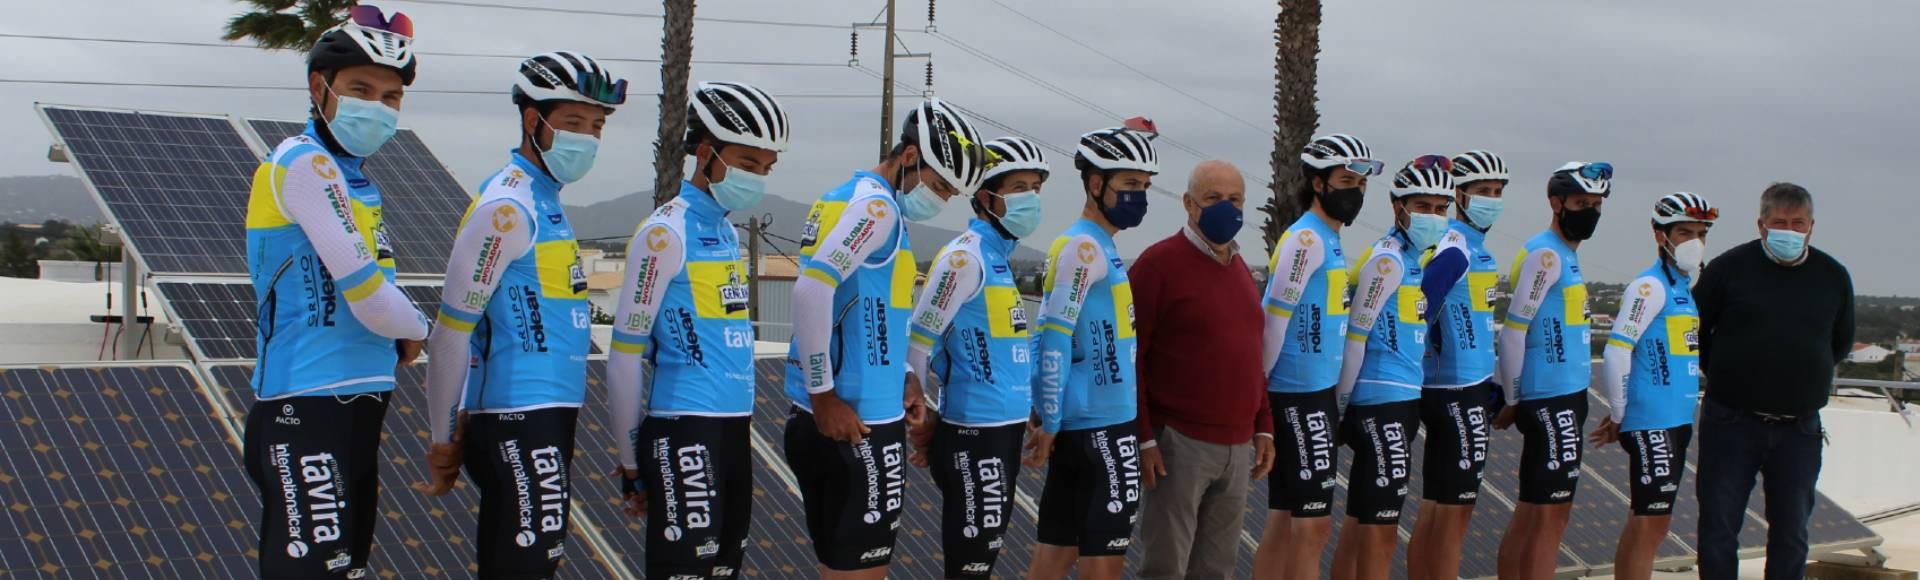 Grupo Rolear renova apoio ao Clube Ciclismo Tavira